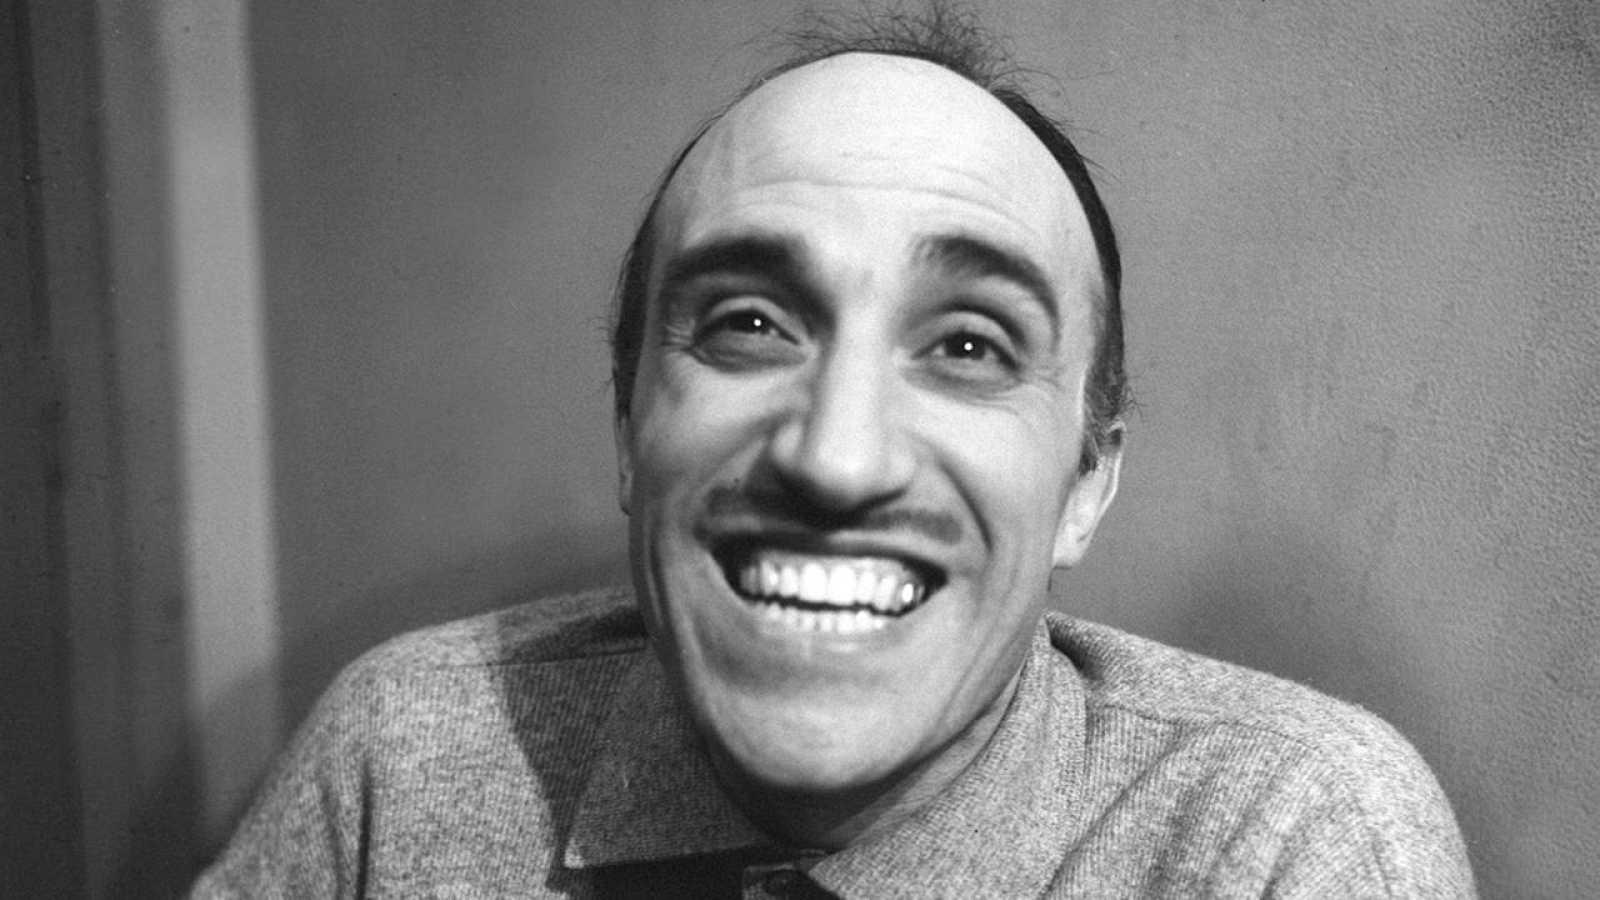 El actor barcelonés José Sazatornil en 1967